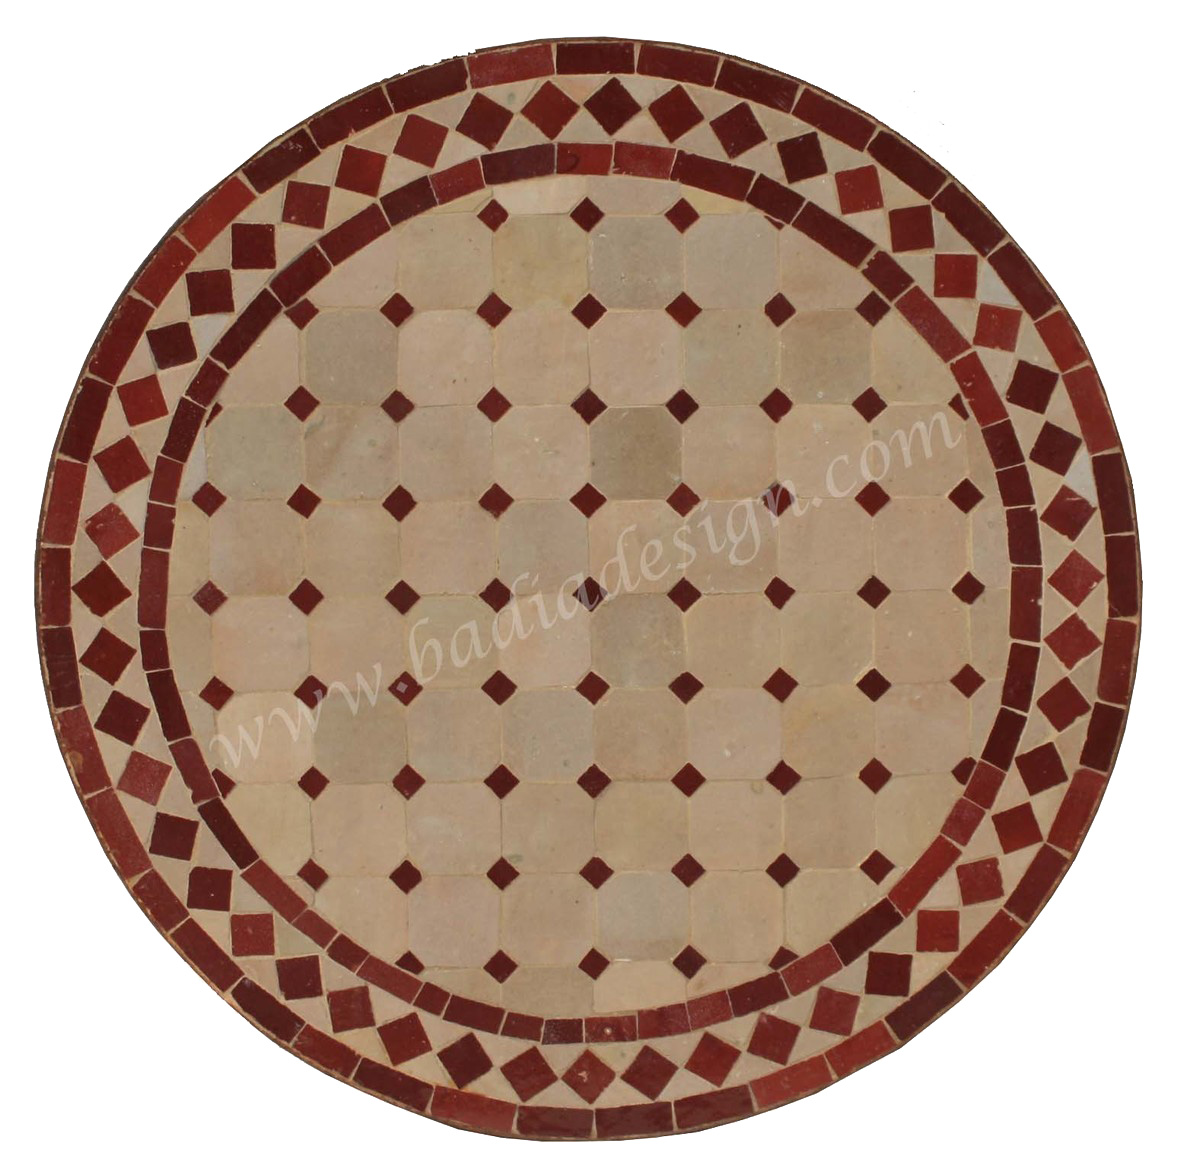 moroccan-tile-table-top-mtr209-1-57683.1490732488.1280.1280.jpg